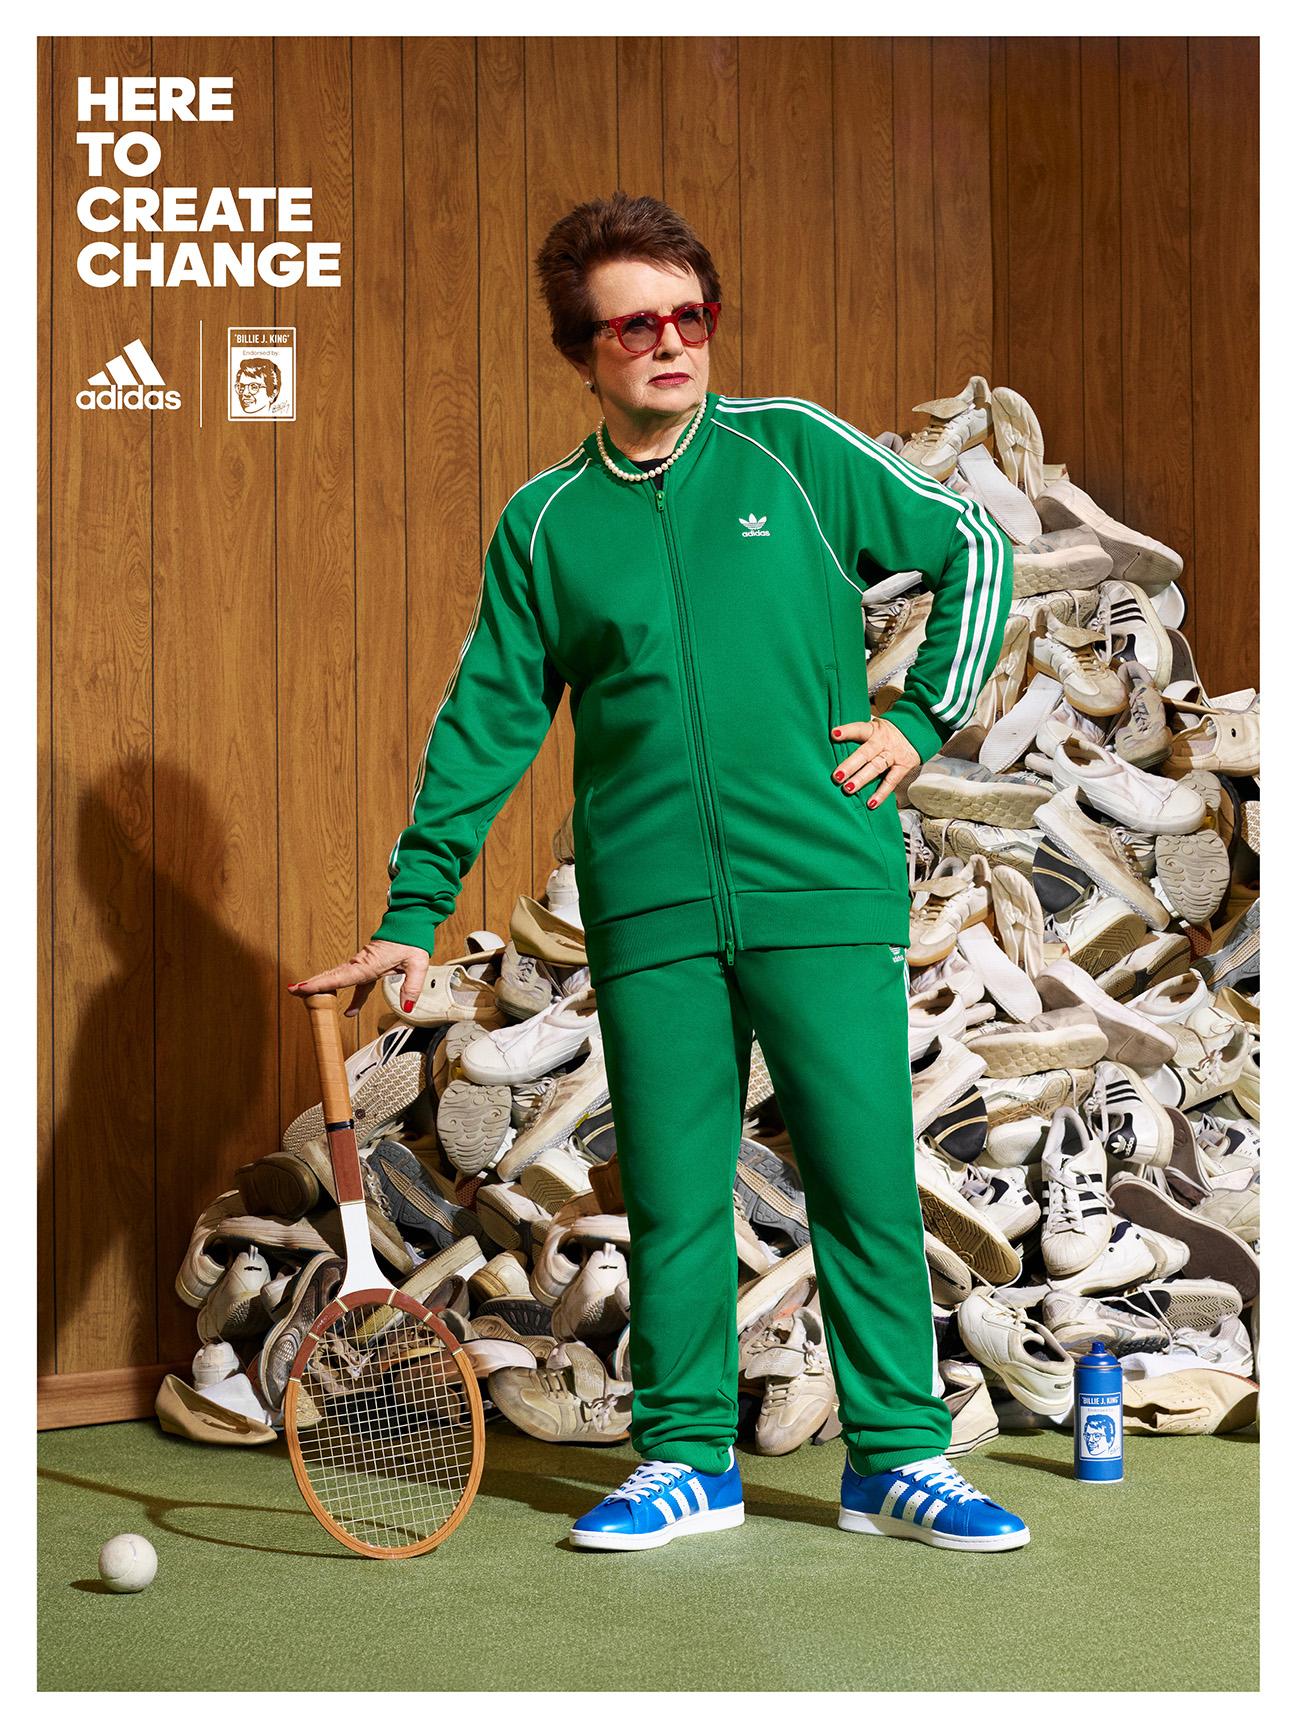 adidas_BJK-OOH_4800h2.jpg